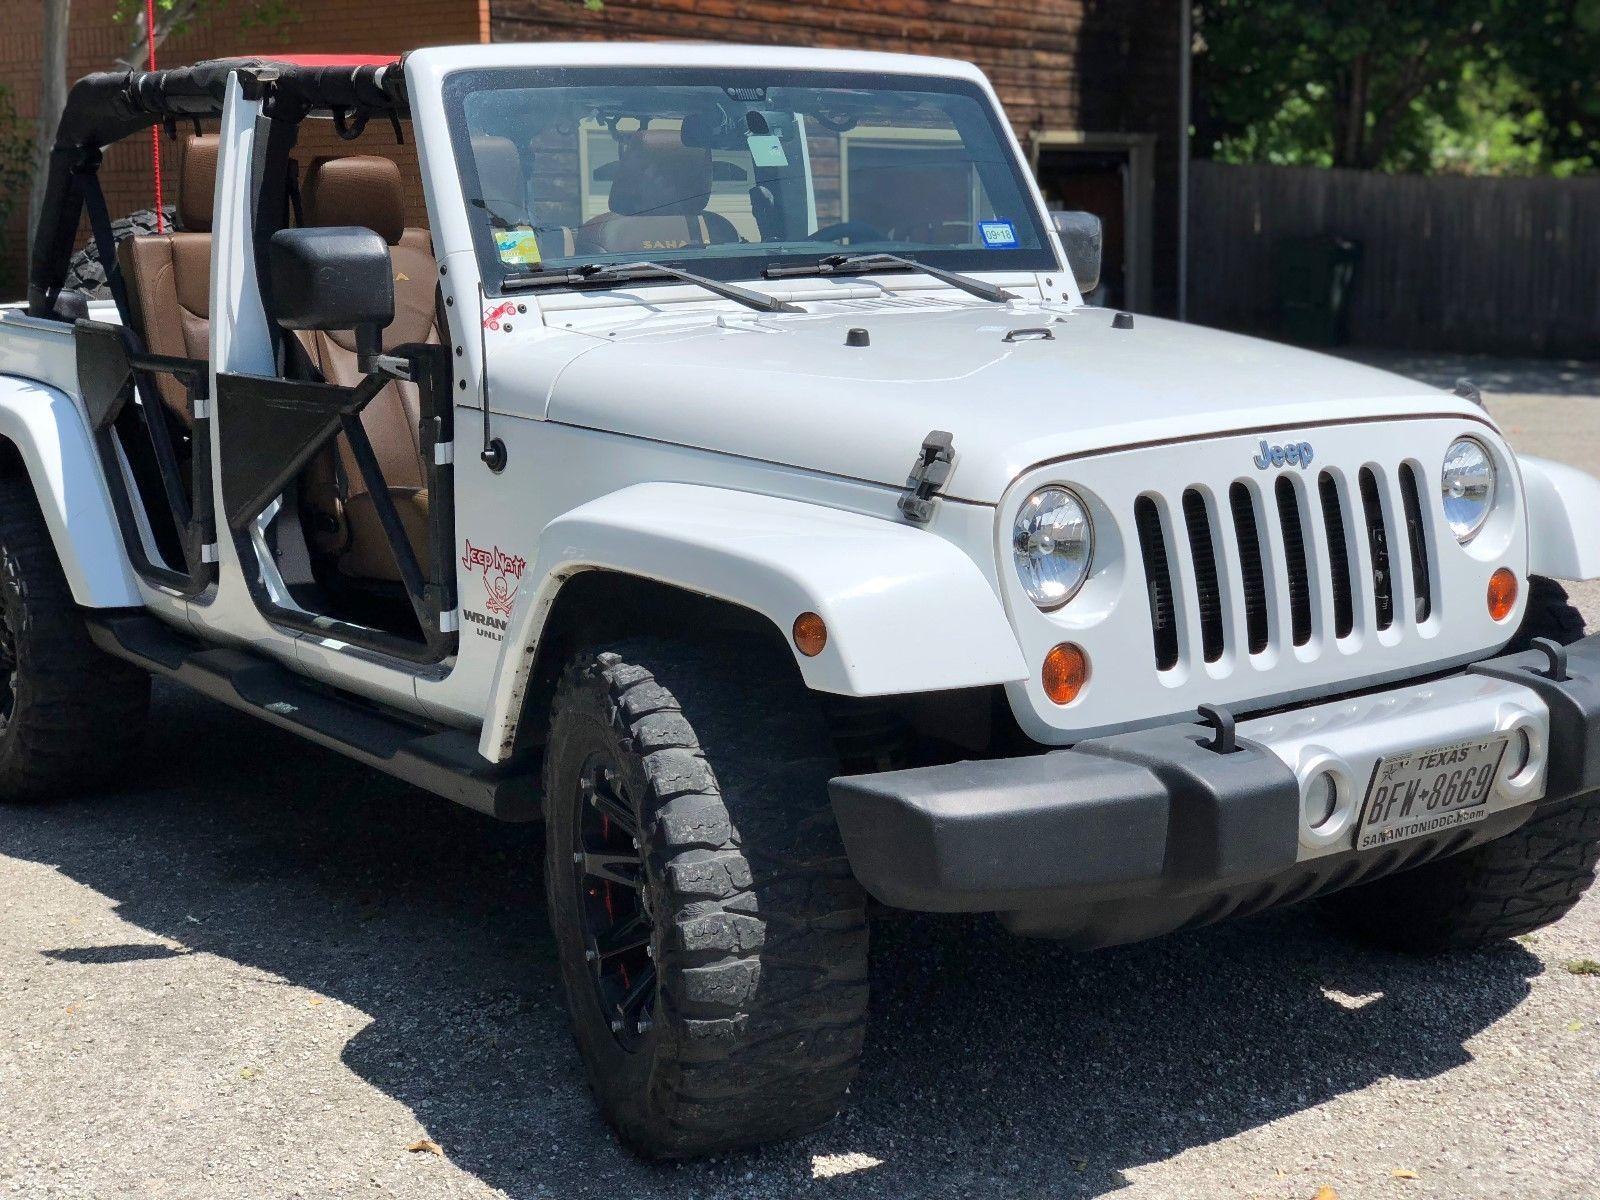 2013 Jeep Wrangler Sahara 2013 Jeep Wrangler Jeep Wrangler Sahara White Jeep Wrangler